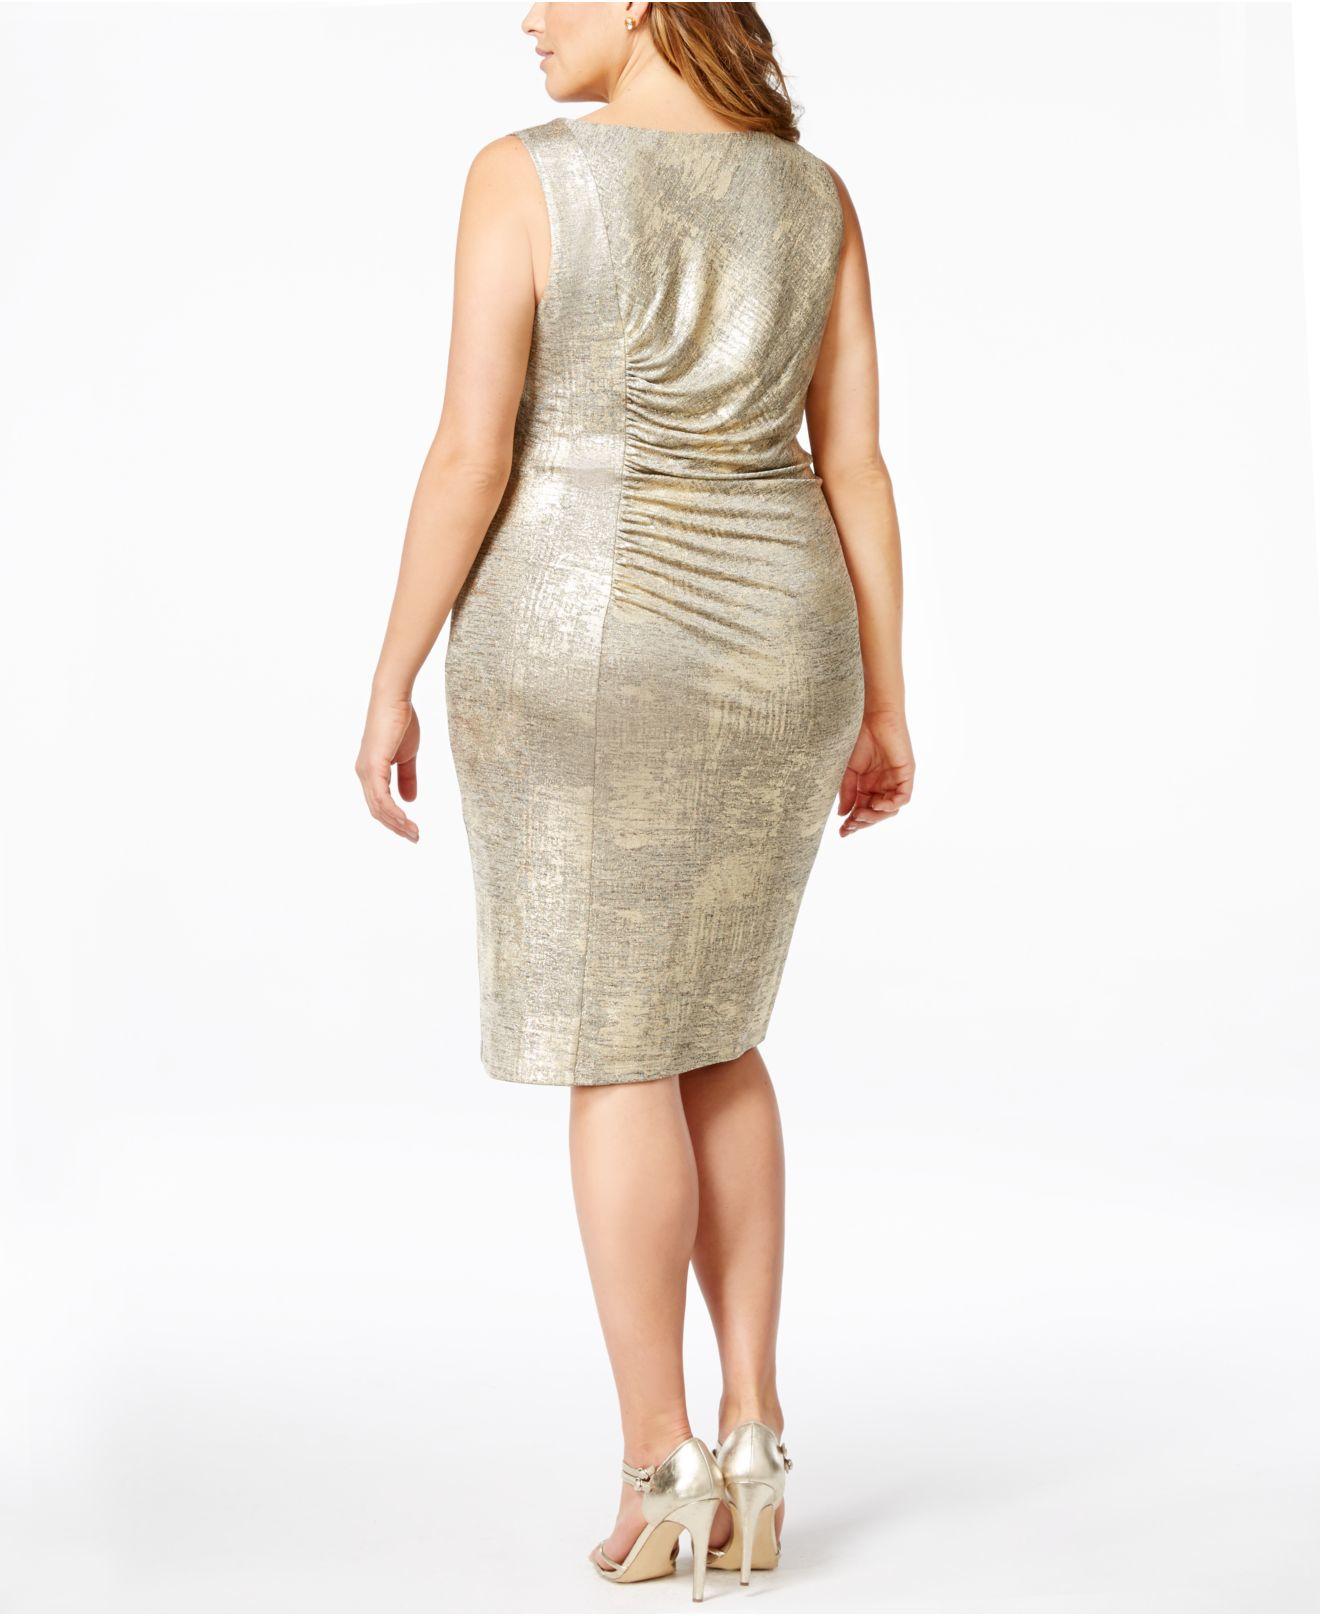 Calvin klein Plus Size Ruched Metallic Sheath Dress in Metallic | Lyst